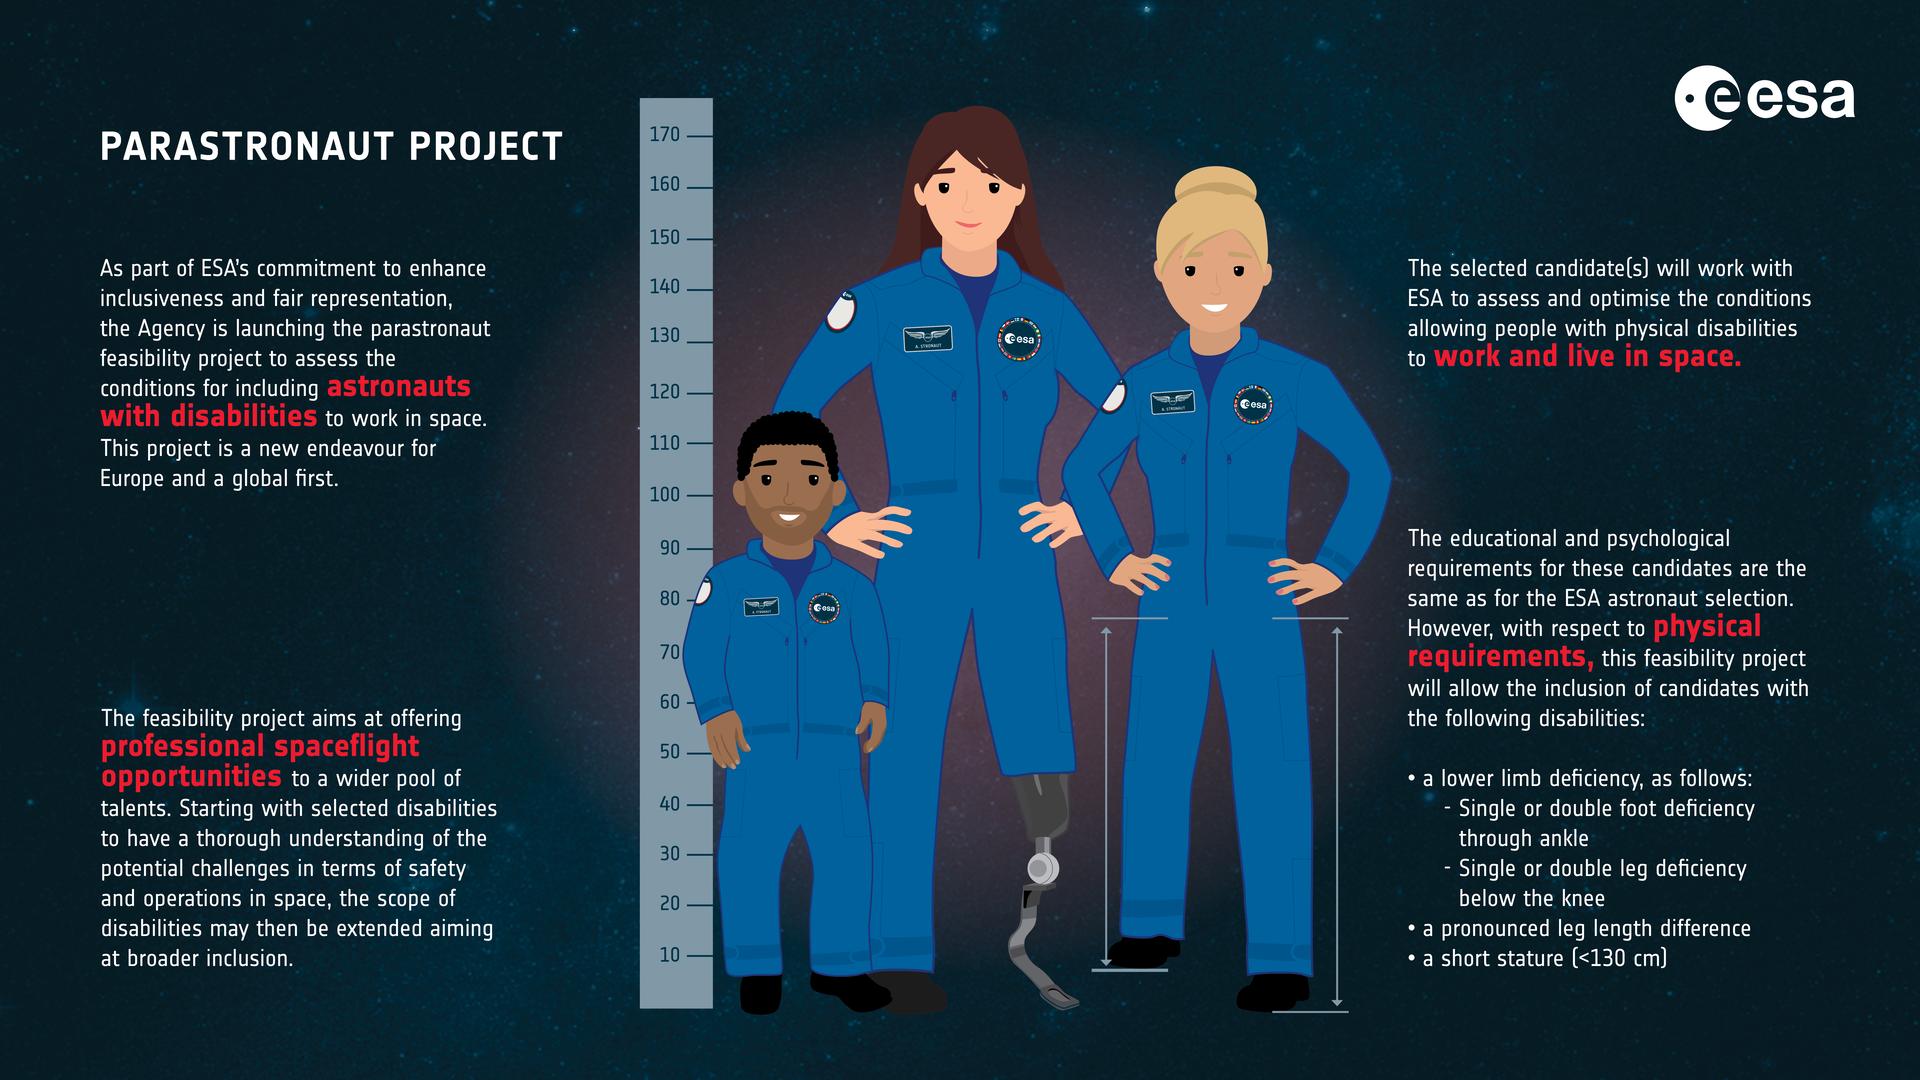 Astronaut selection: parastronaut feasibility project